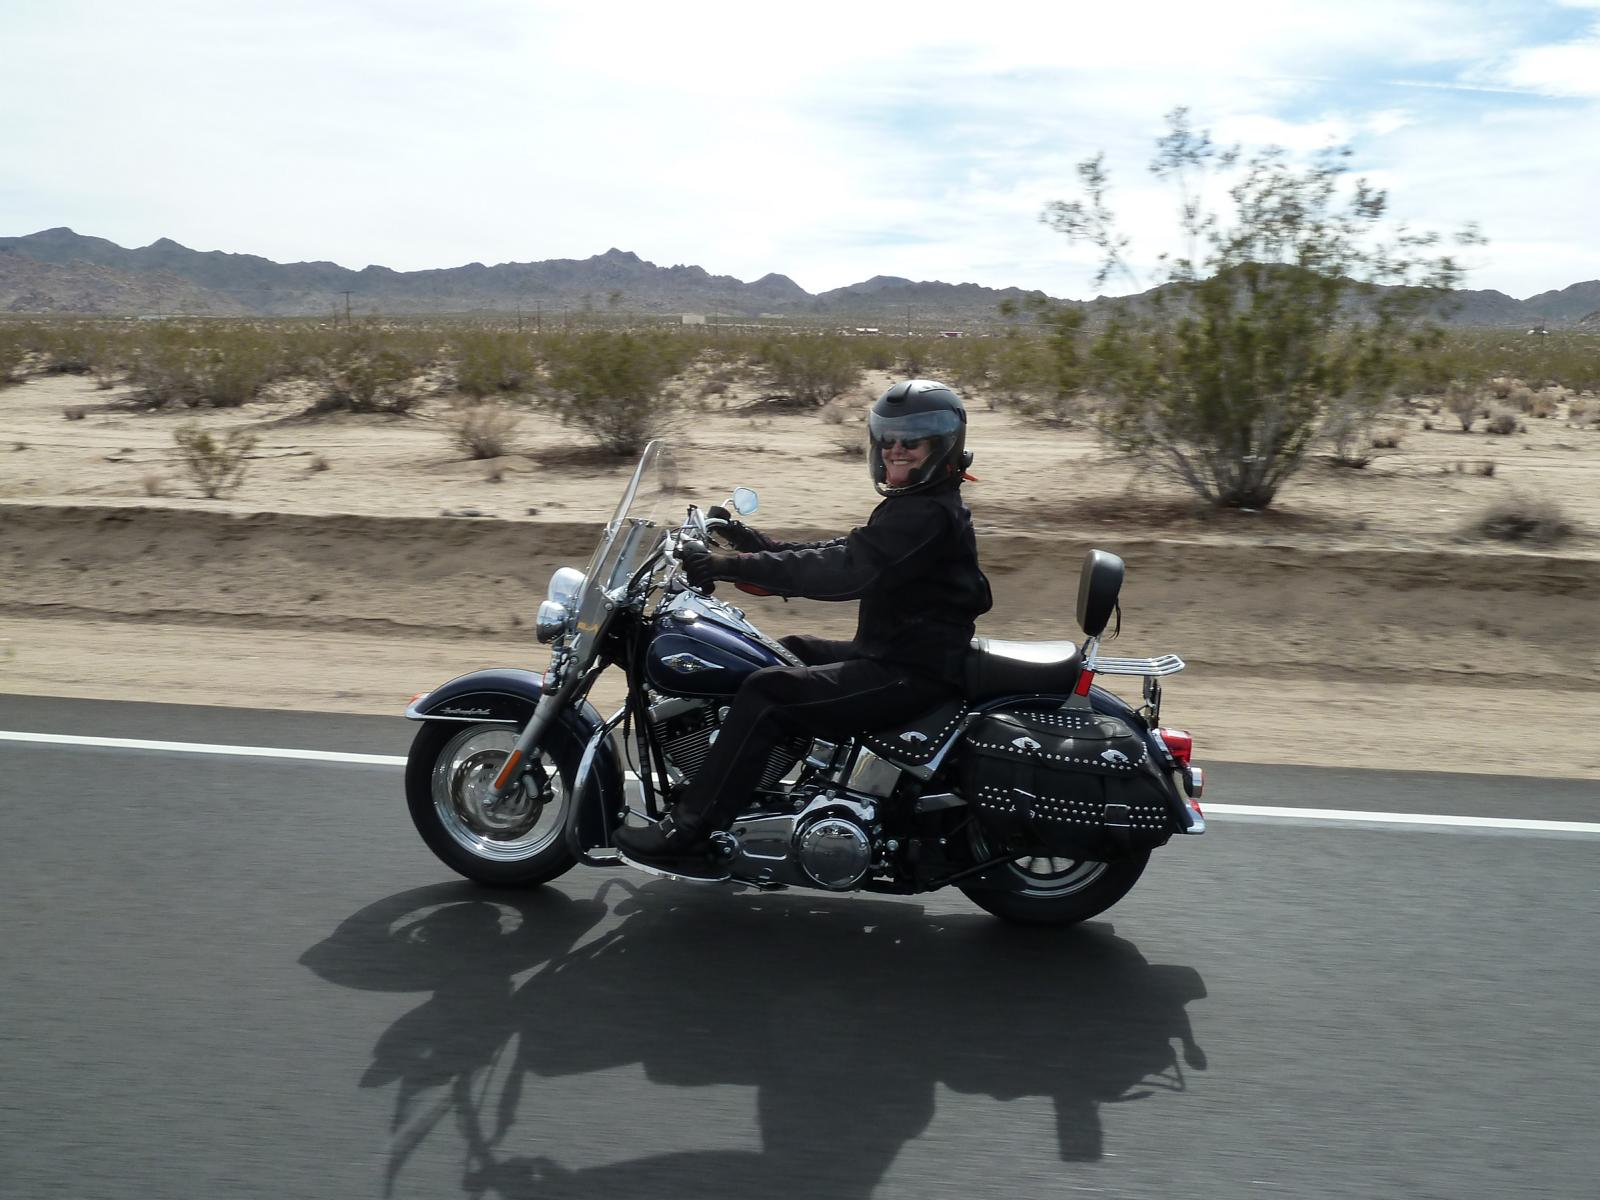 grand canyon las vegas route 66 motorradreise durch. Black Bedroom Furniture Sets. Home Design Ideas